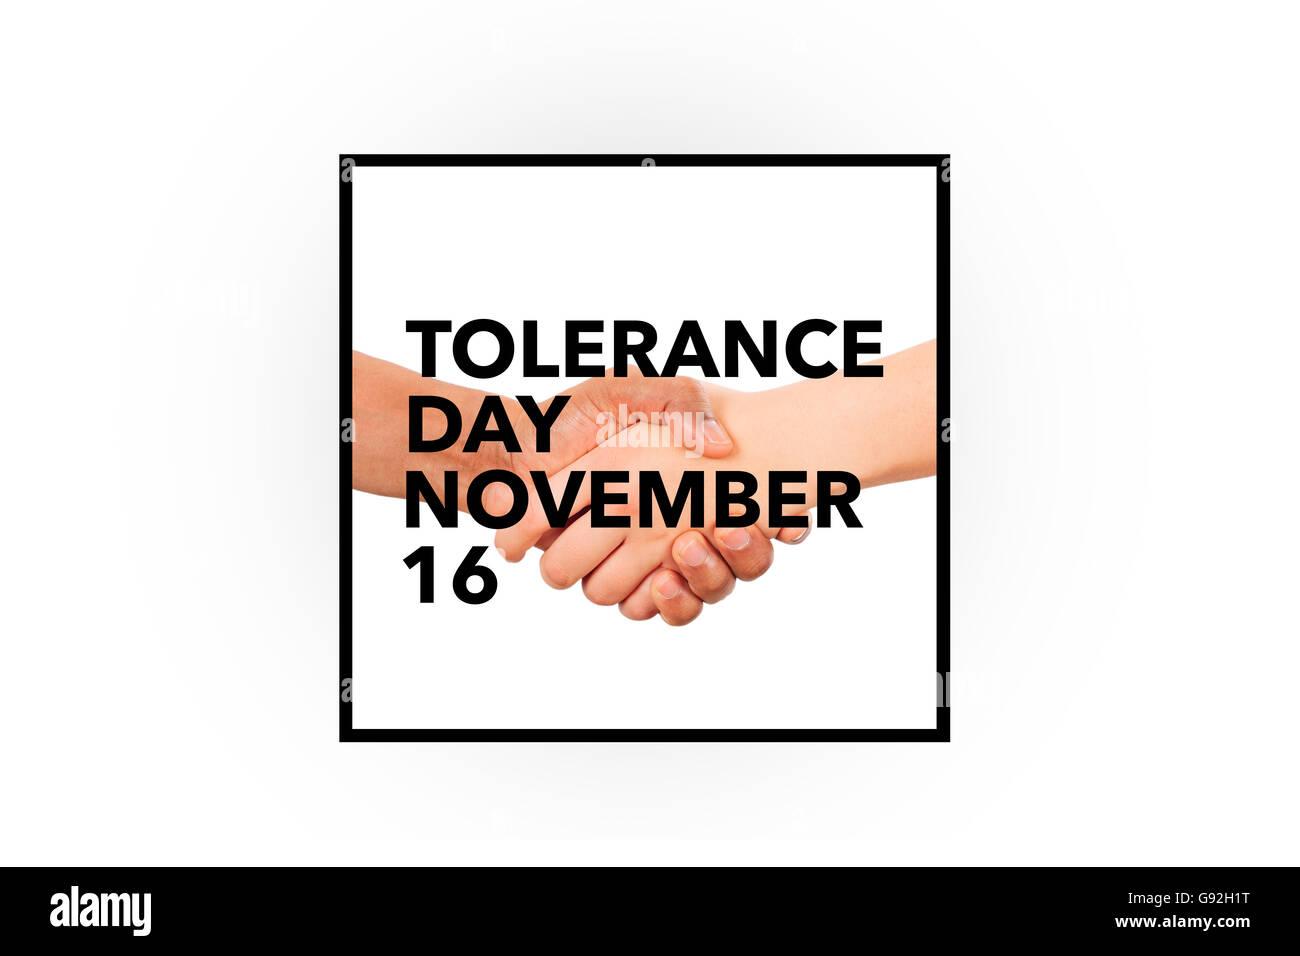 international tolerance day - Stock Image